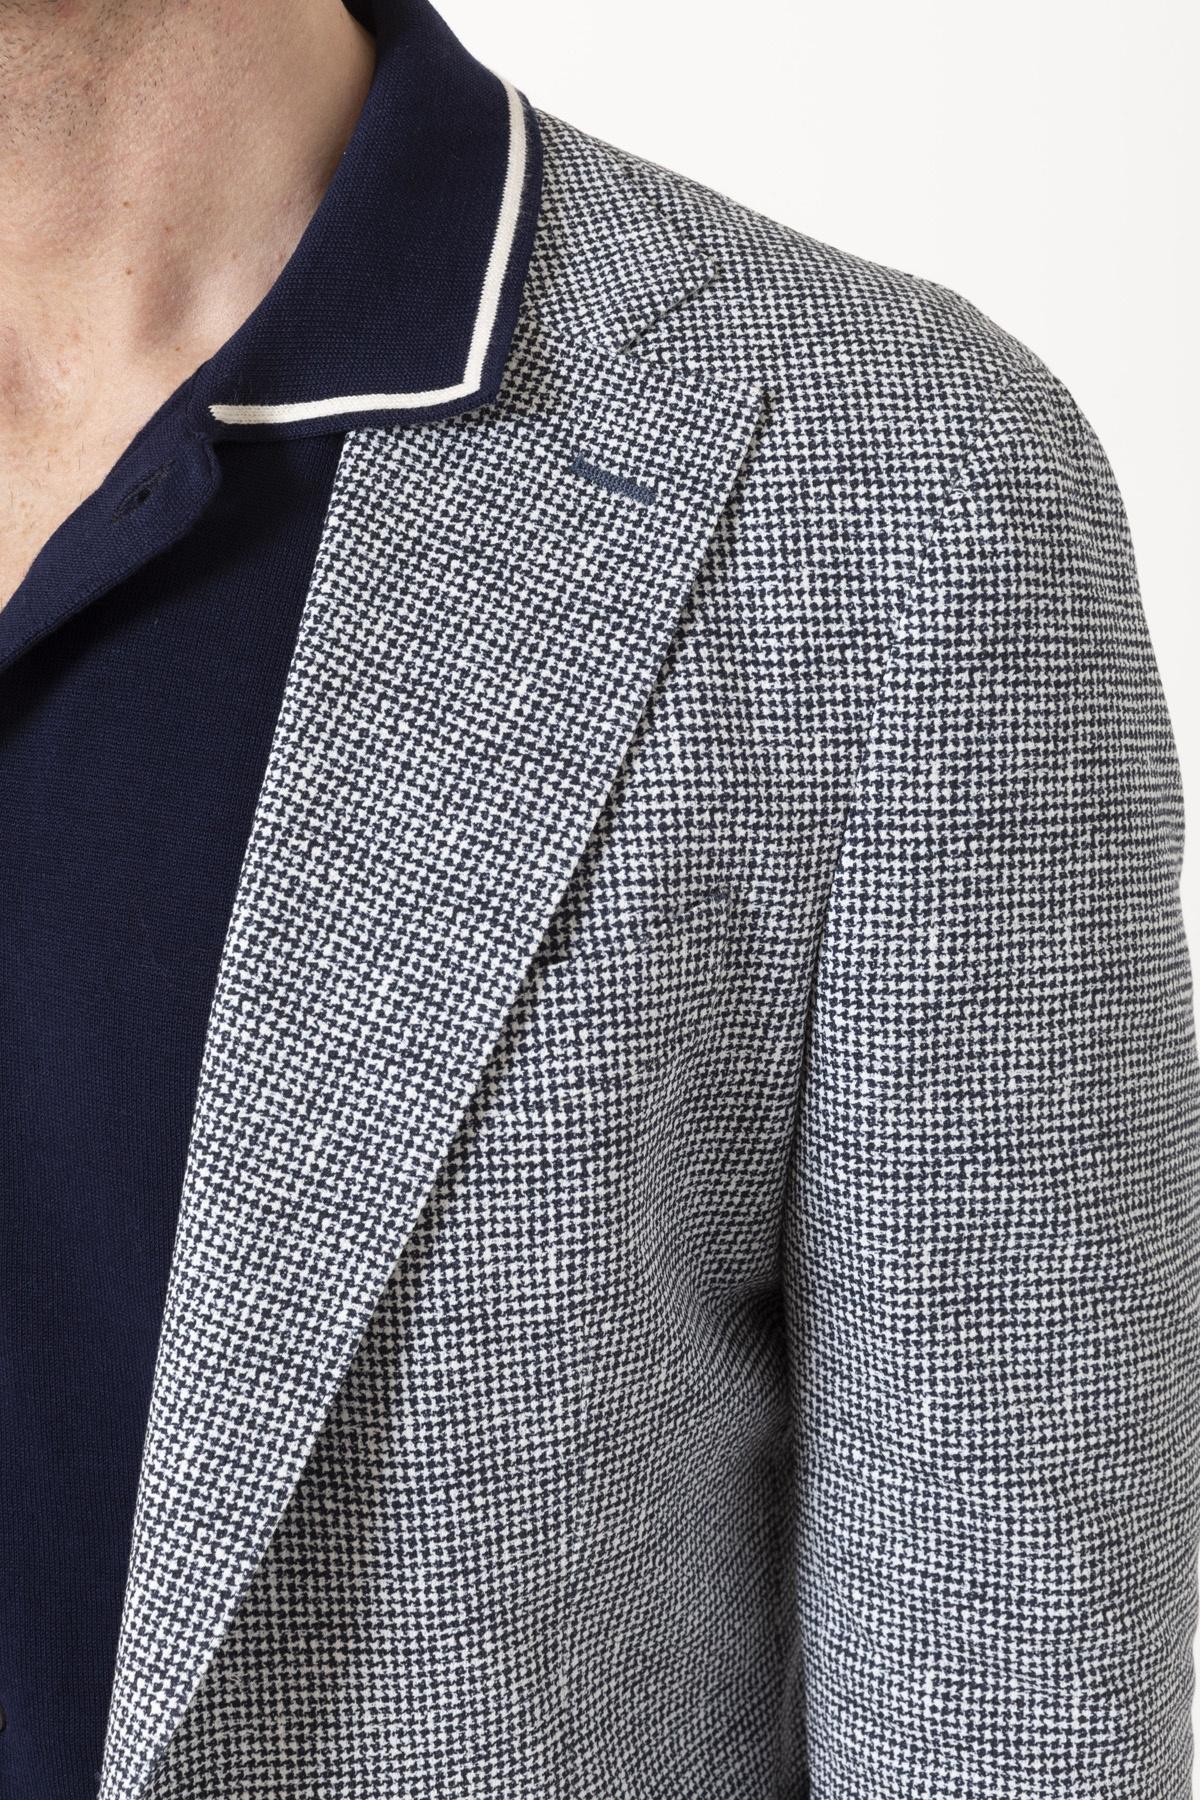 SOFT LUXURY Jacket for man BAGNOLI S/S 21